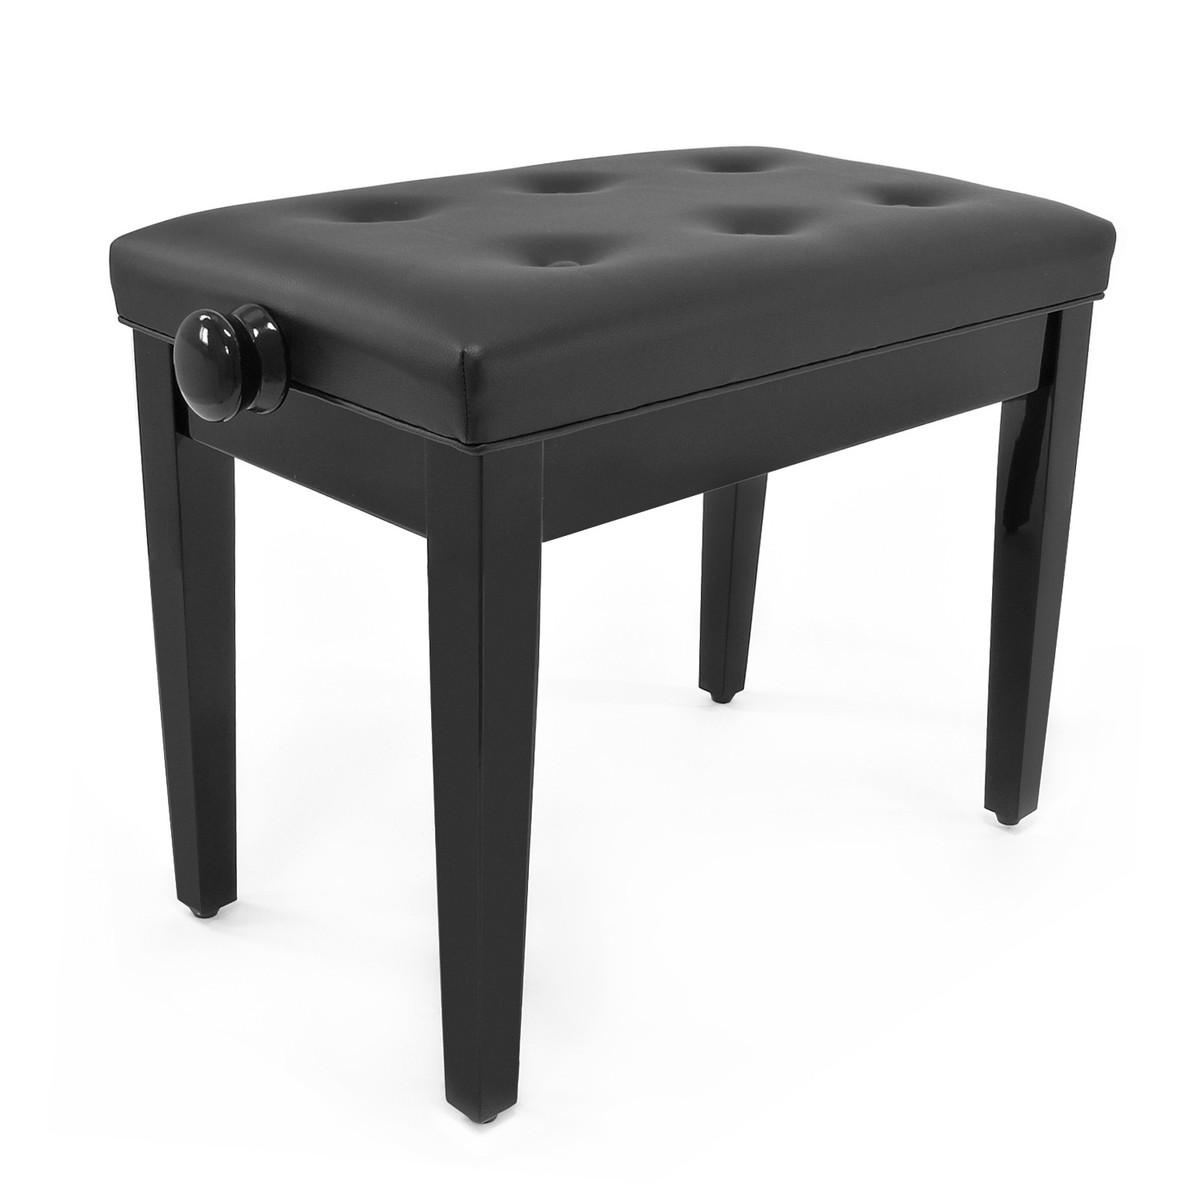 tabouret de piano deluxe par gear4music. Black Bedroom Furniture Sets. Home Design Ideas